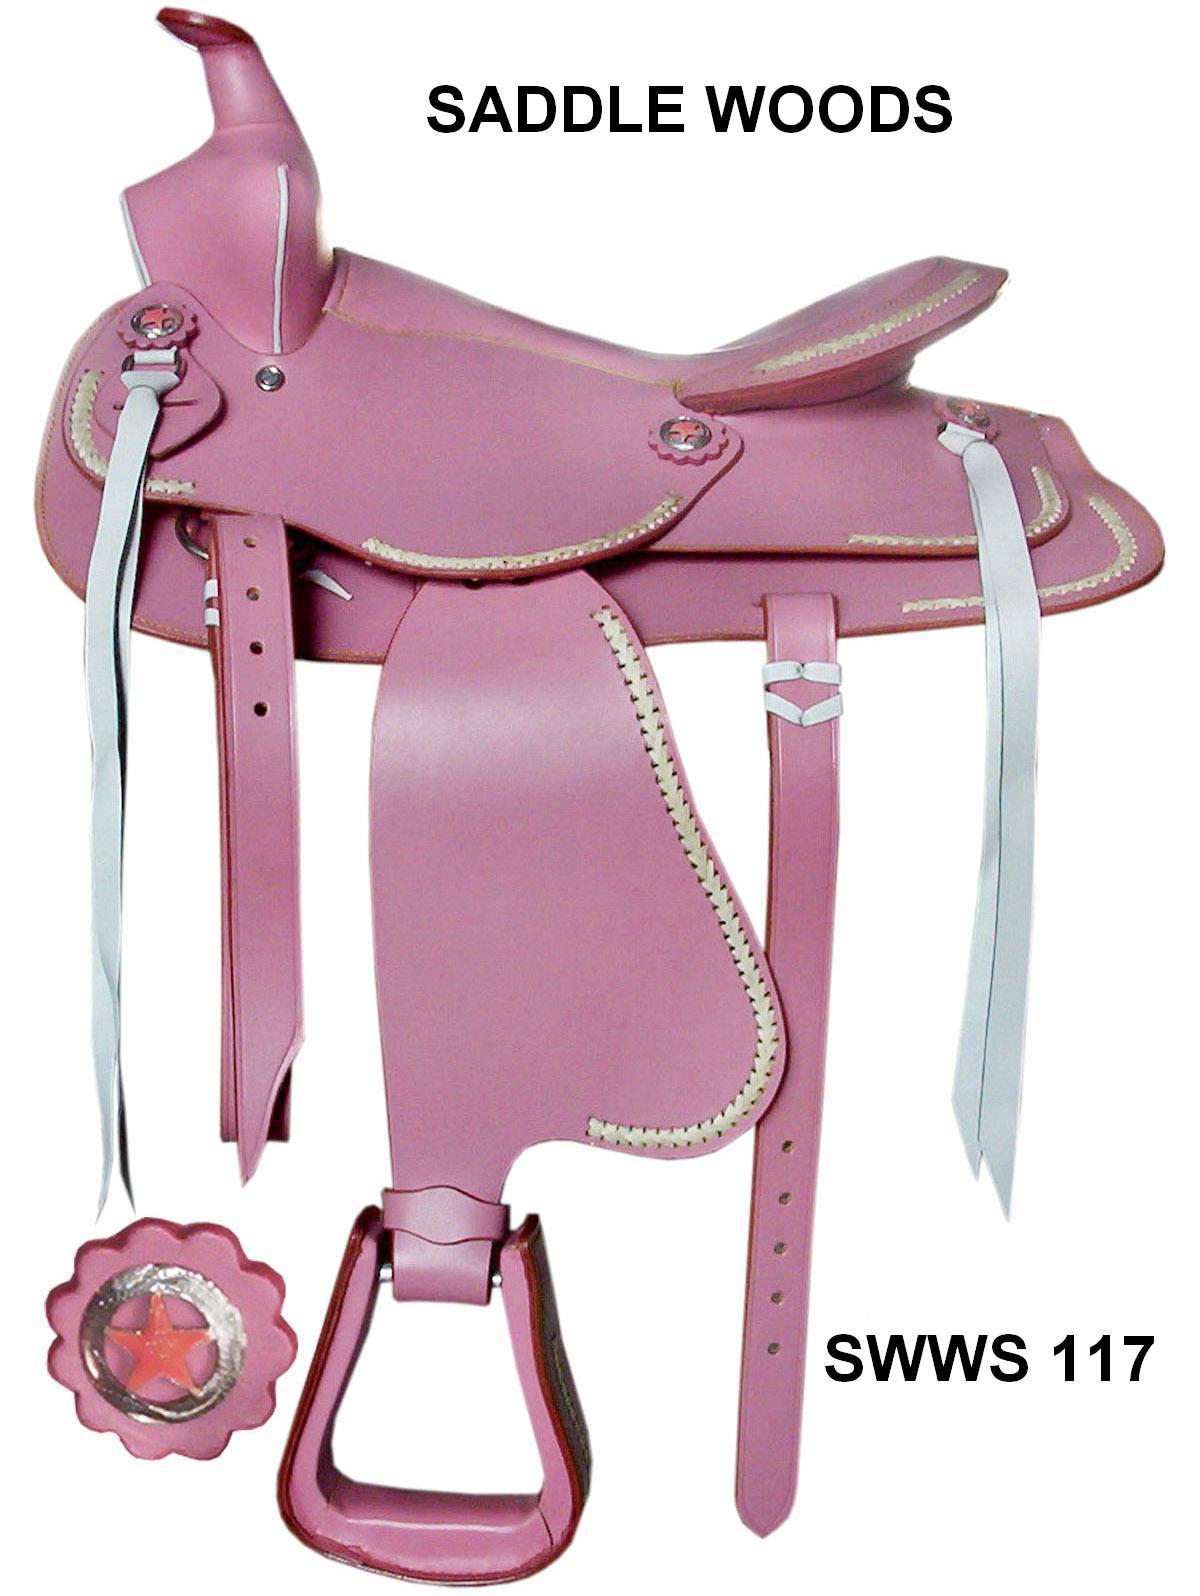 Horse gear- saddles, halters, saddle pads, bridles etc